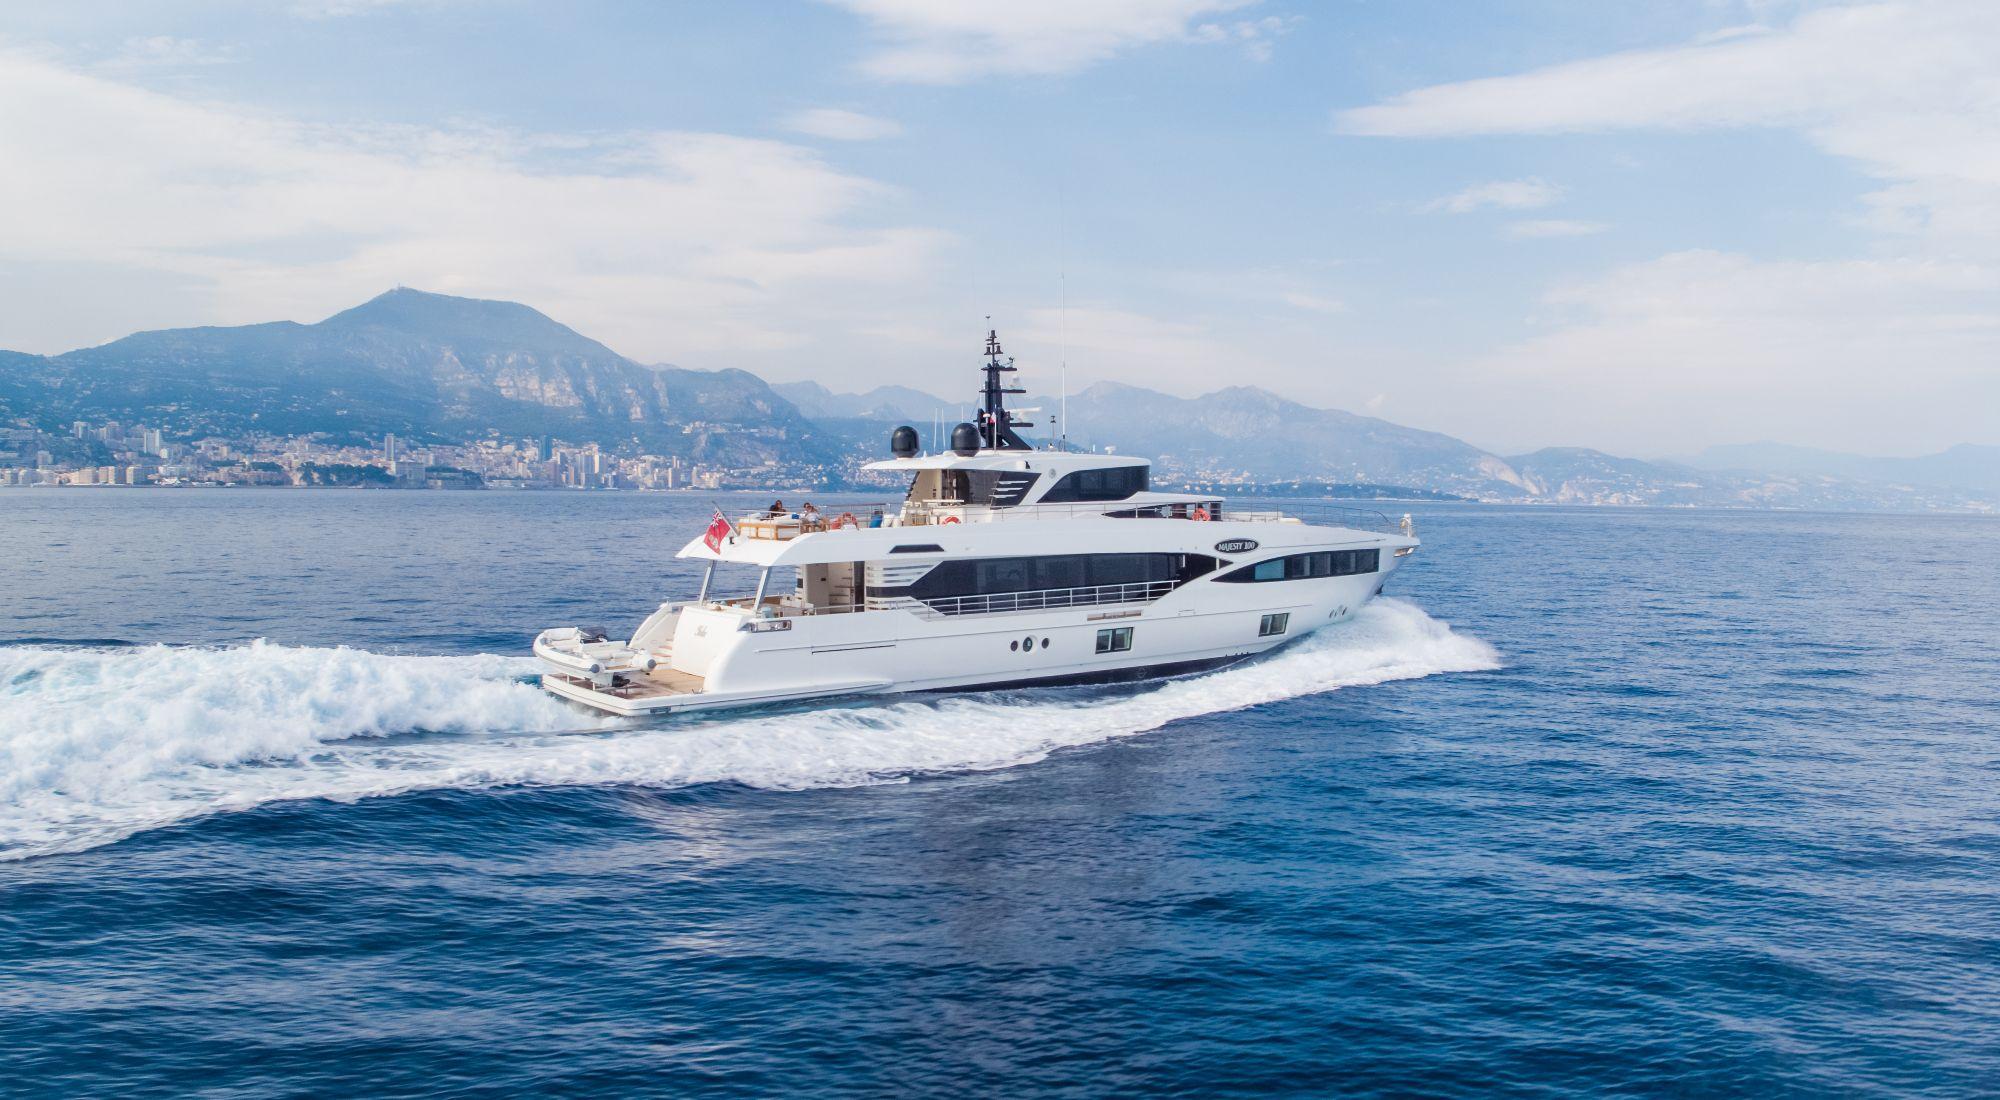 Majesty 100 yacht for sale